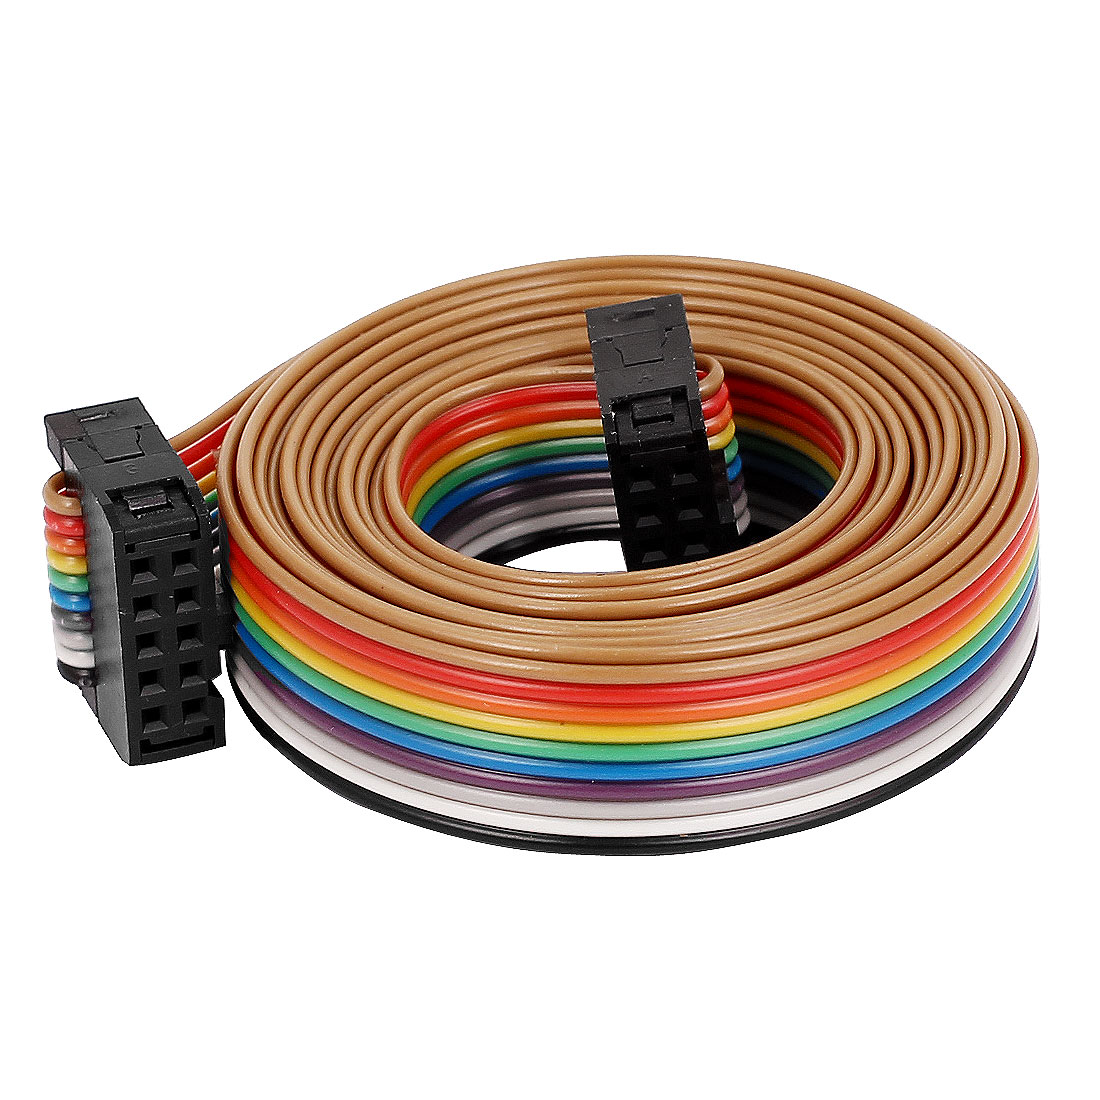 2.54mm Pitch 10Pin 10 Way F/F Connector IDC Flat Rainbow Ribbon ...